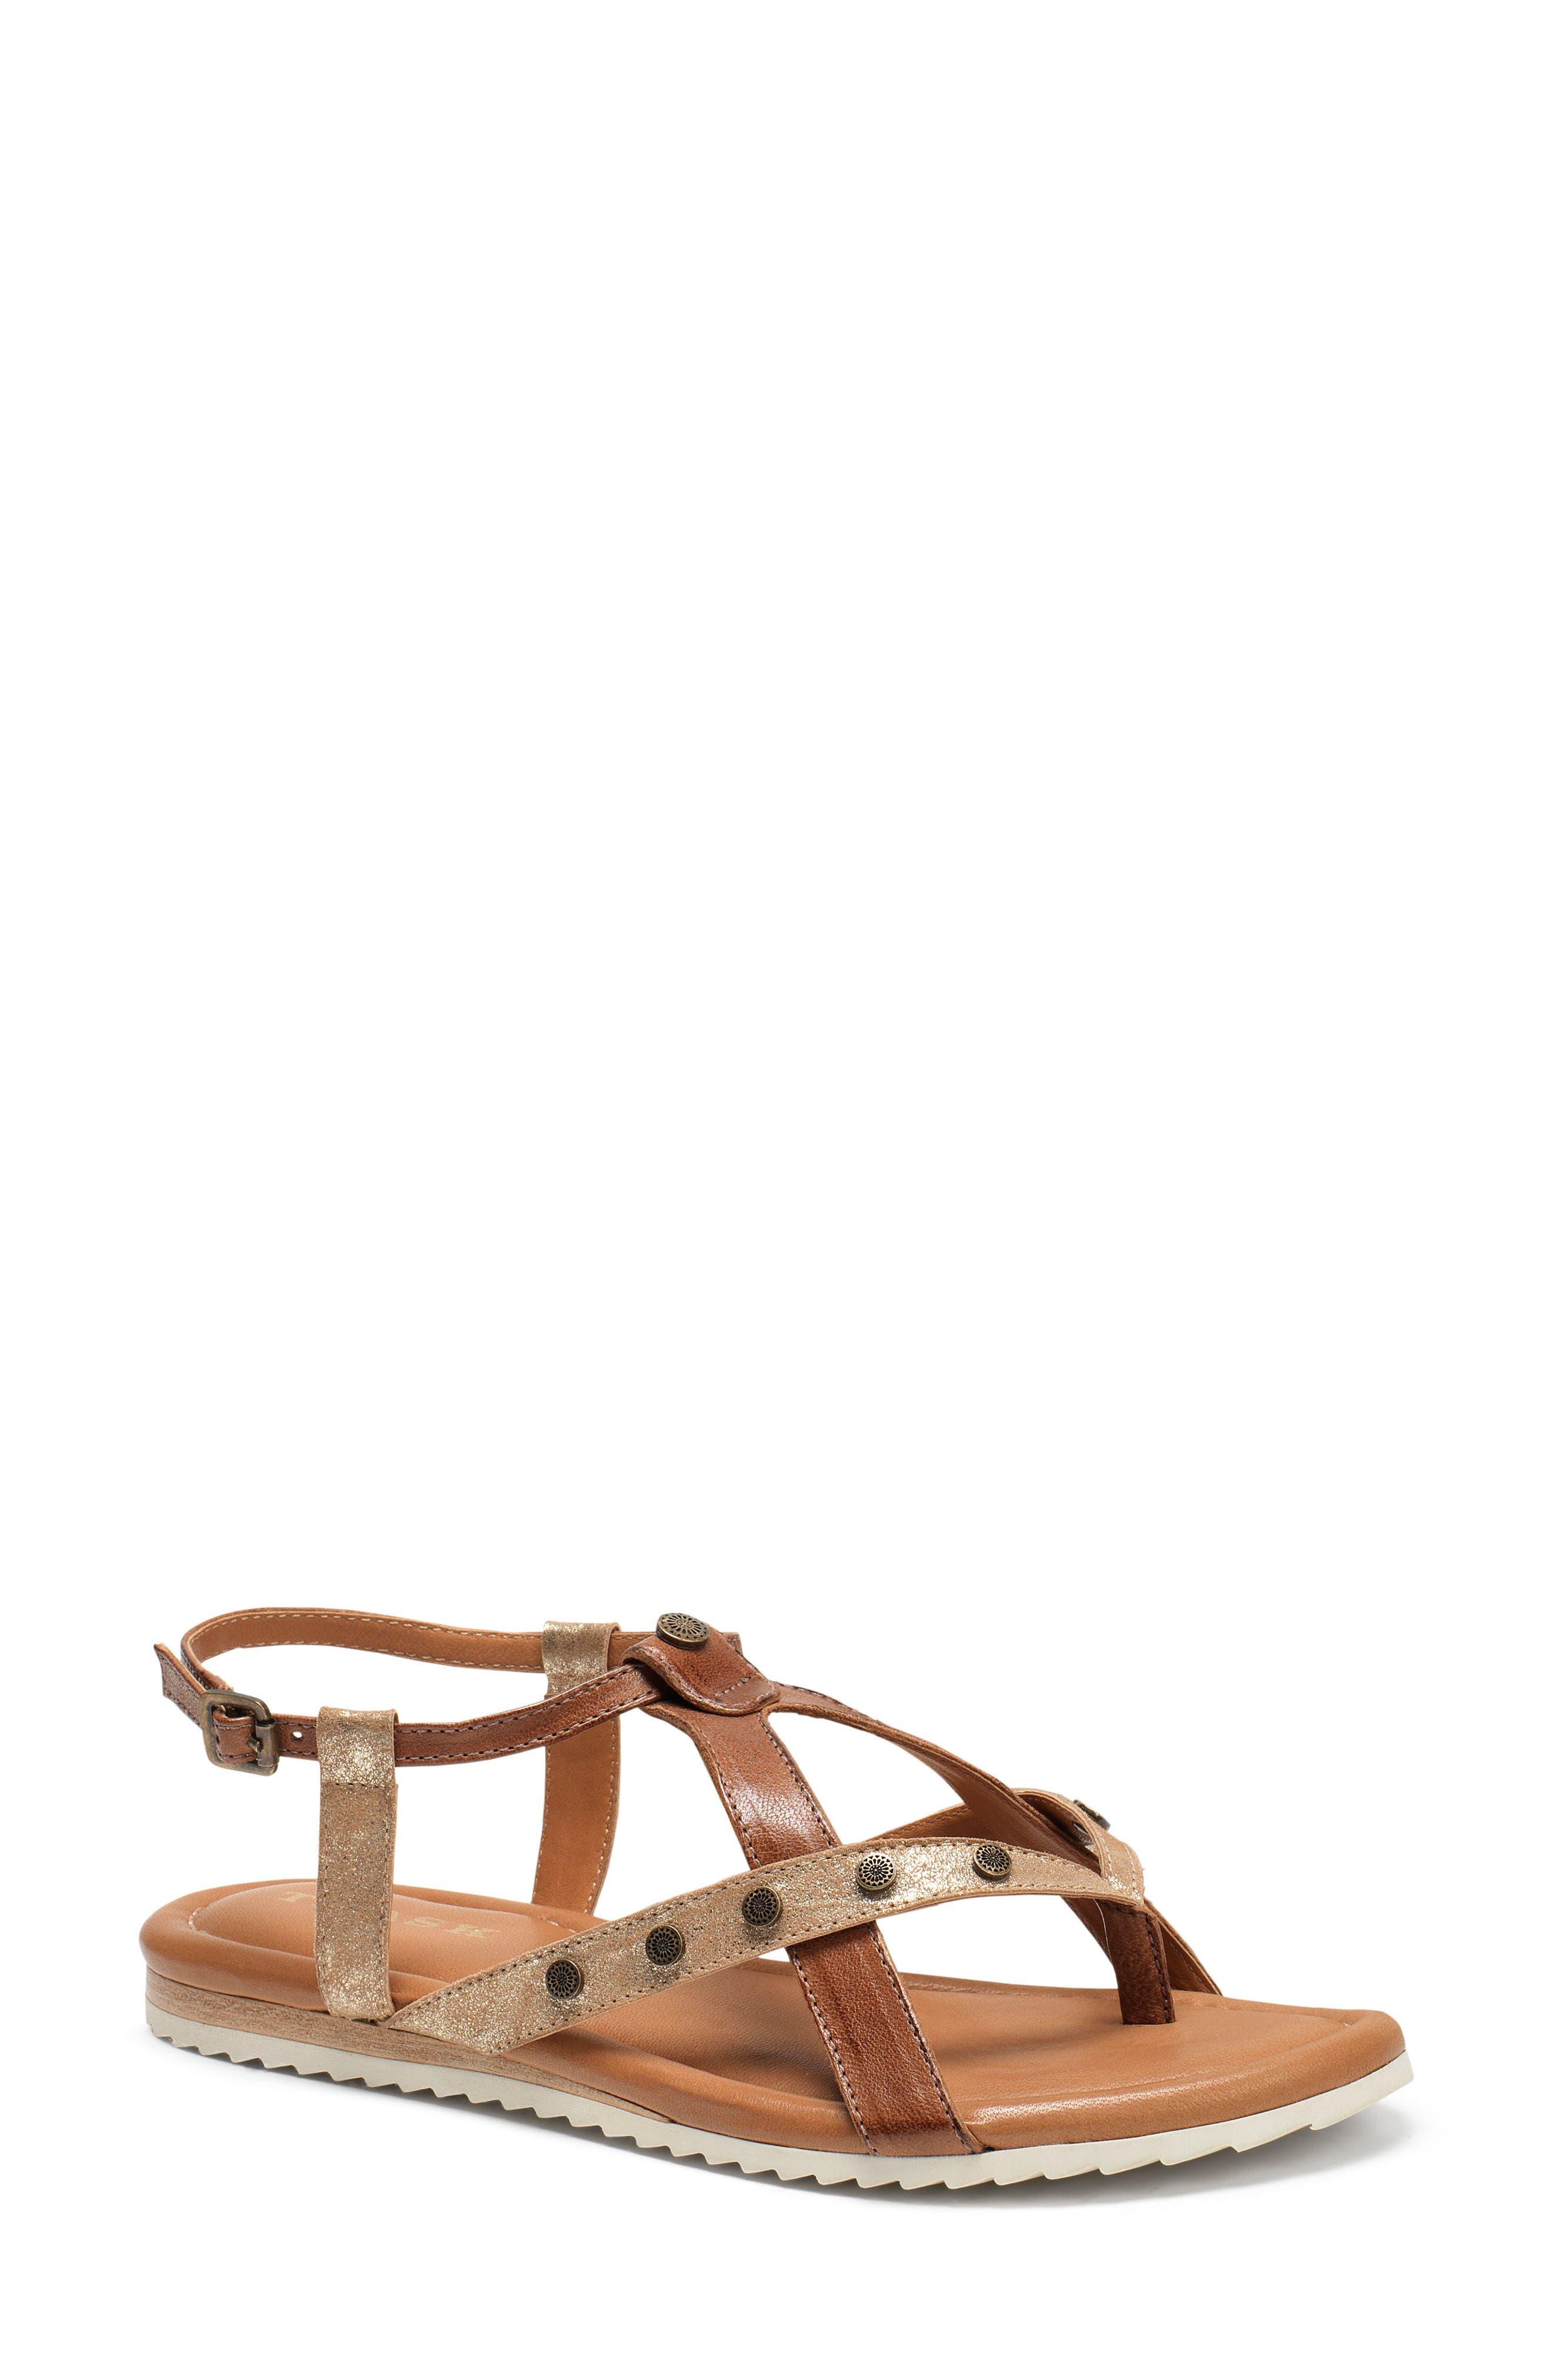 Shayla Water Resistant Sandal,                         Main,                         color, Teak Suede